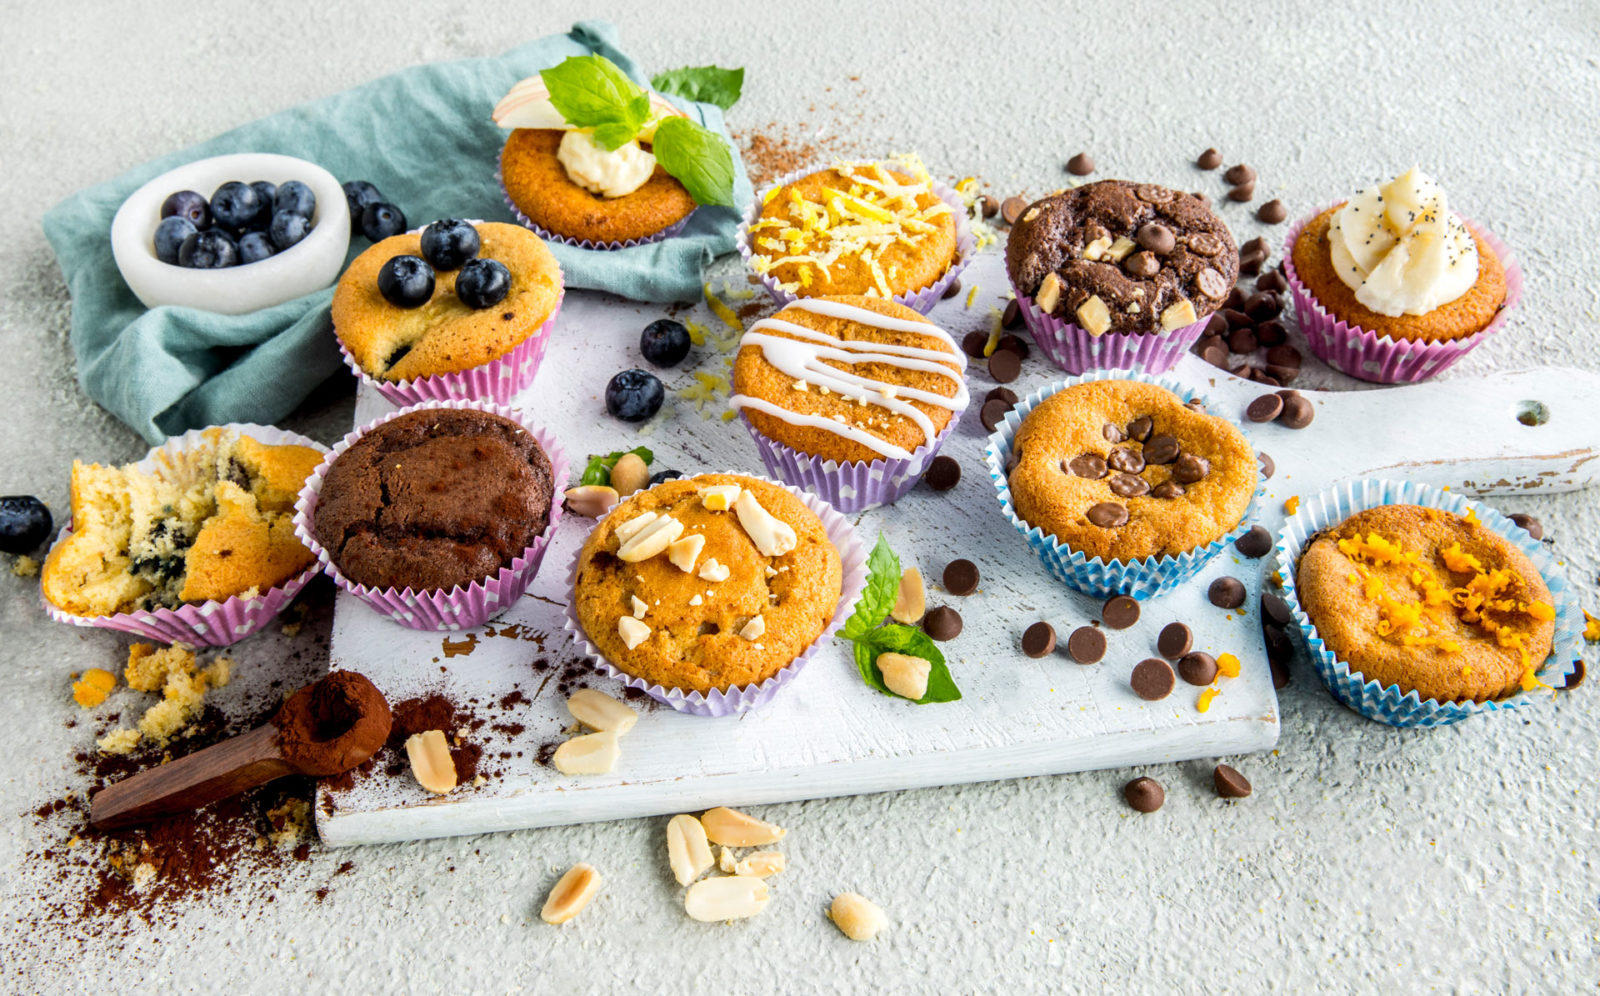 10 ulike muffins av 1 muffinsrøre. Foto.